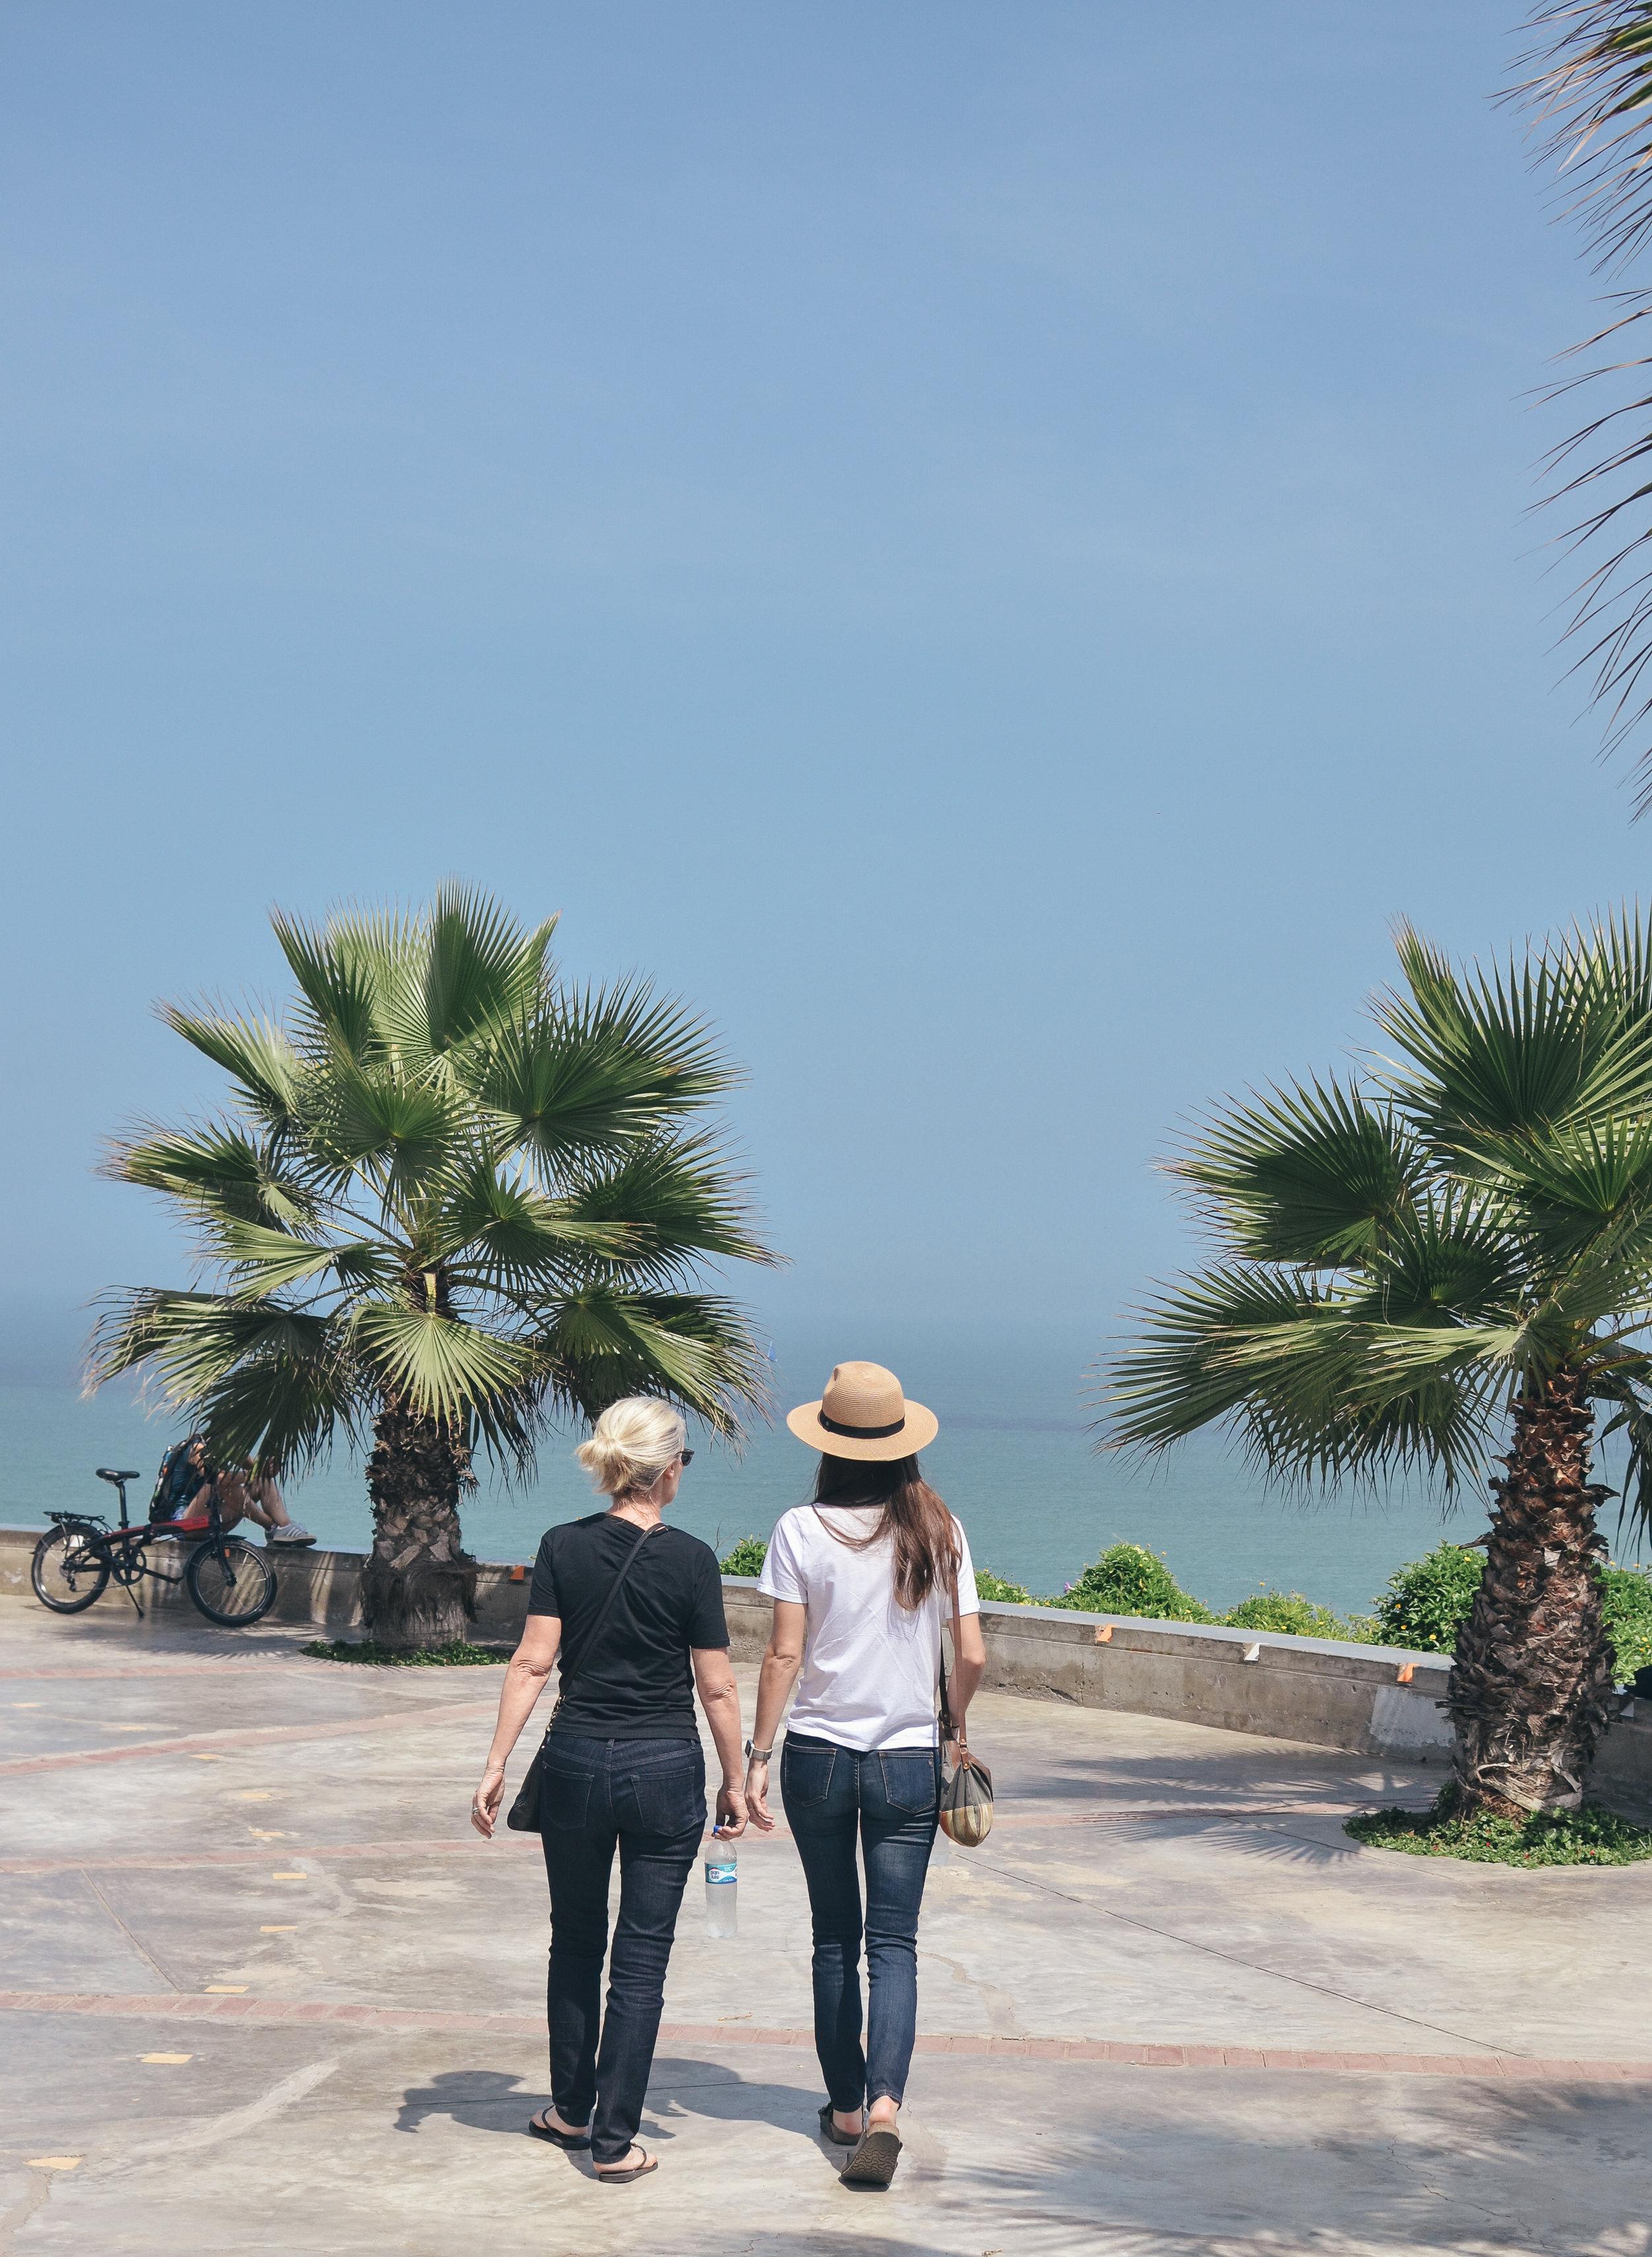 lima+peru+travel+guide+life+on+pine+blog +exchange_DSC_0768.jpg